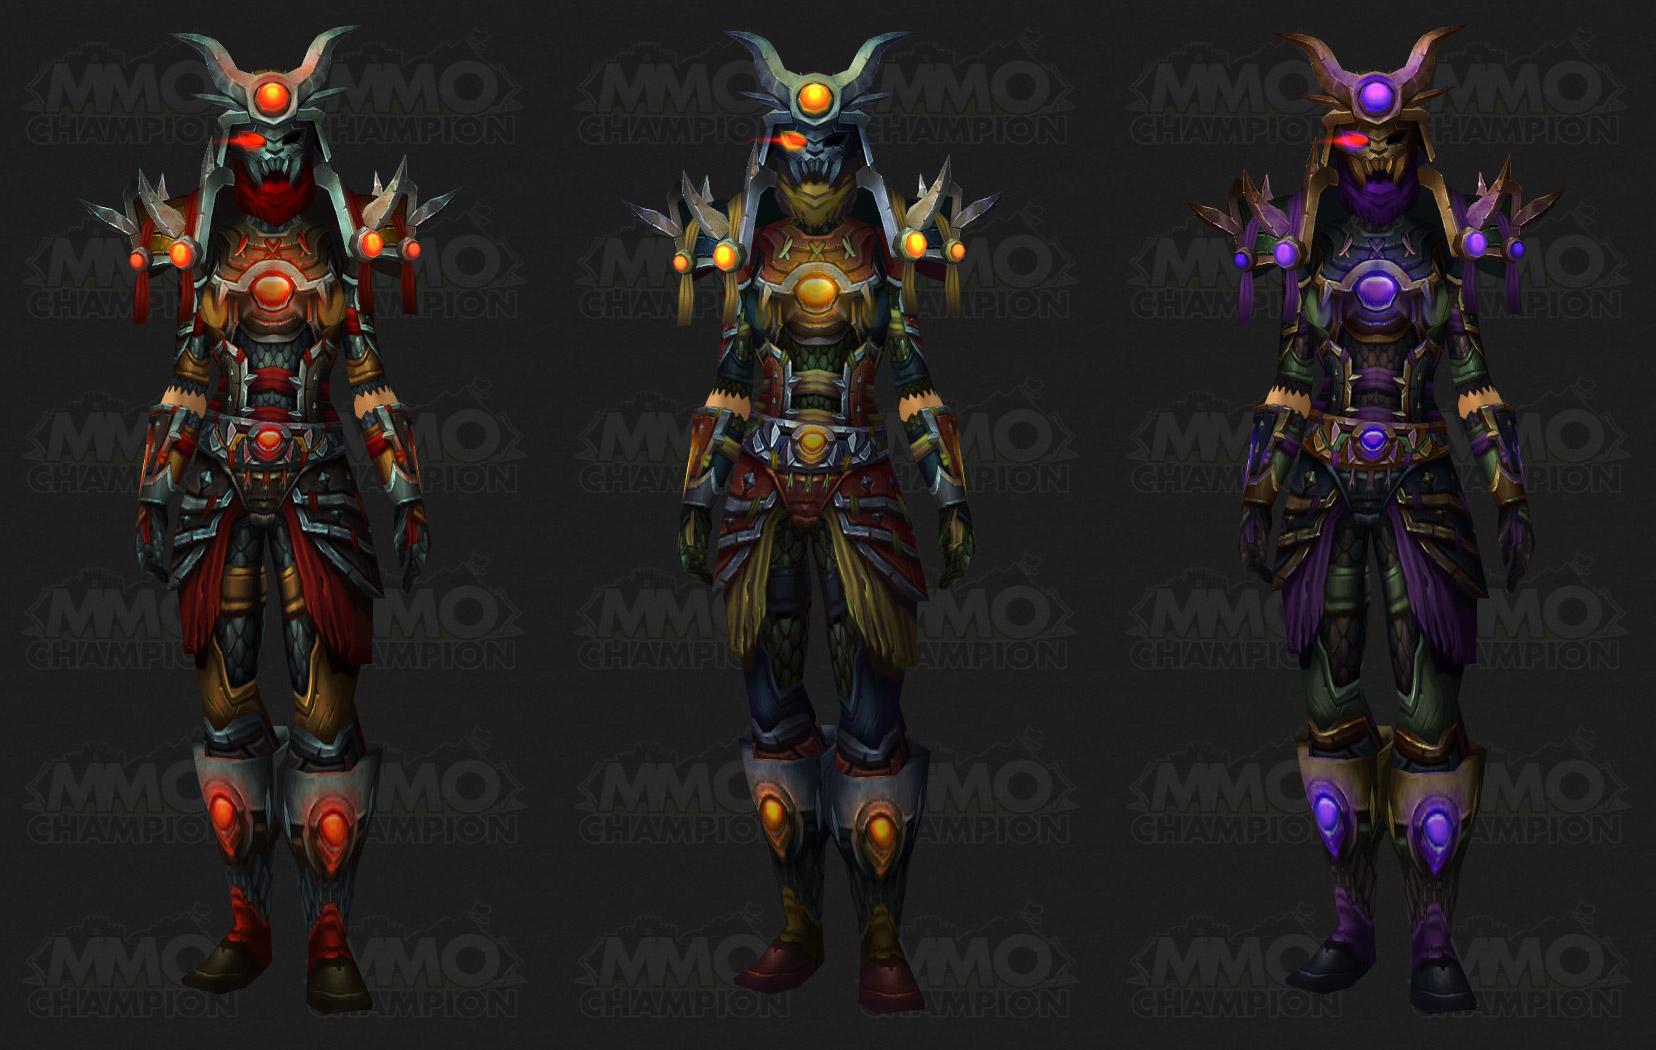 Season 10 Armor Models, Art Gallery Update, Comics